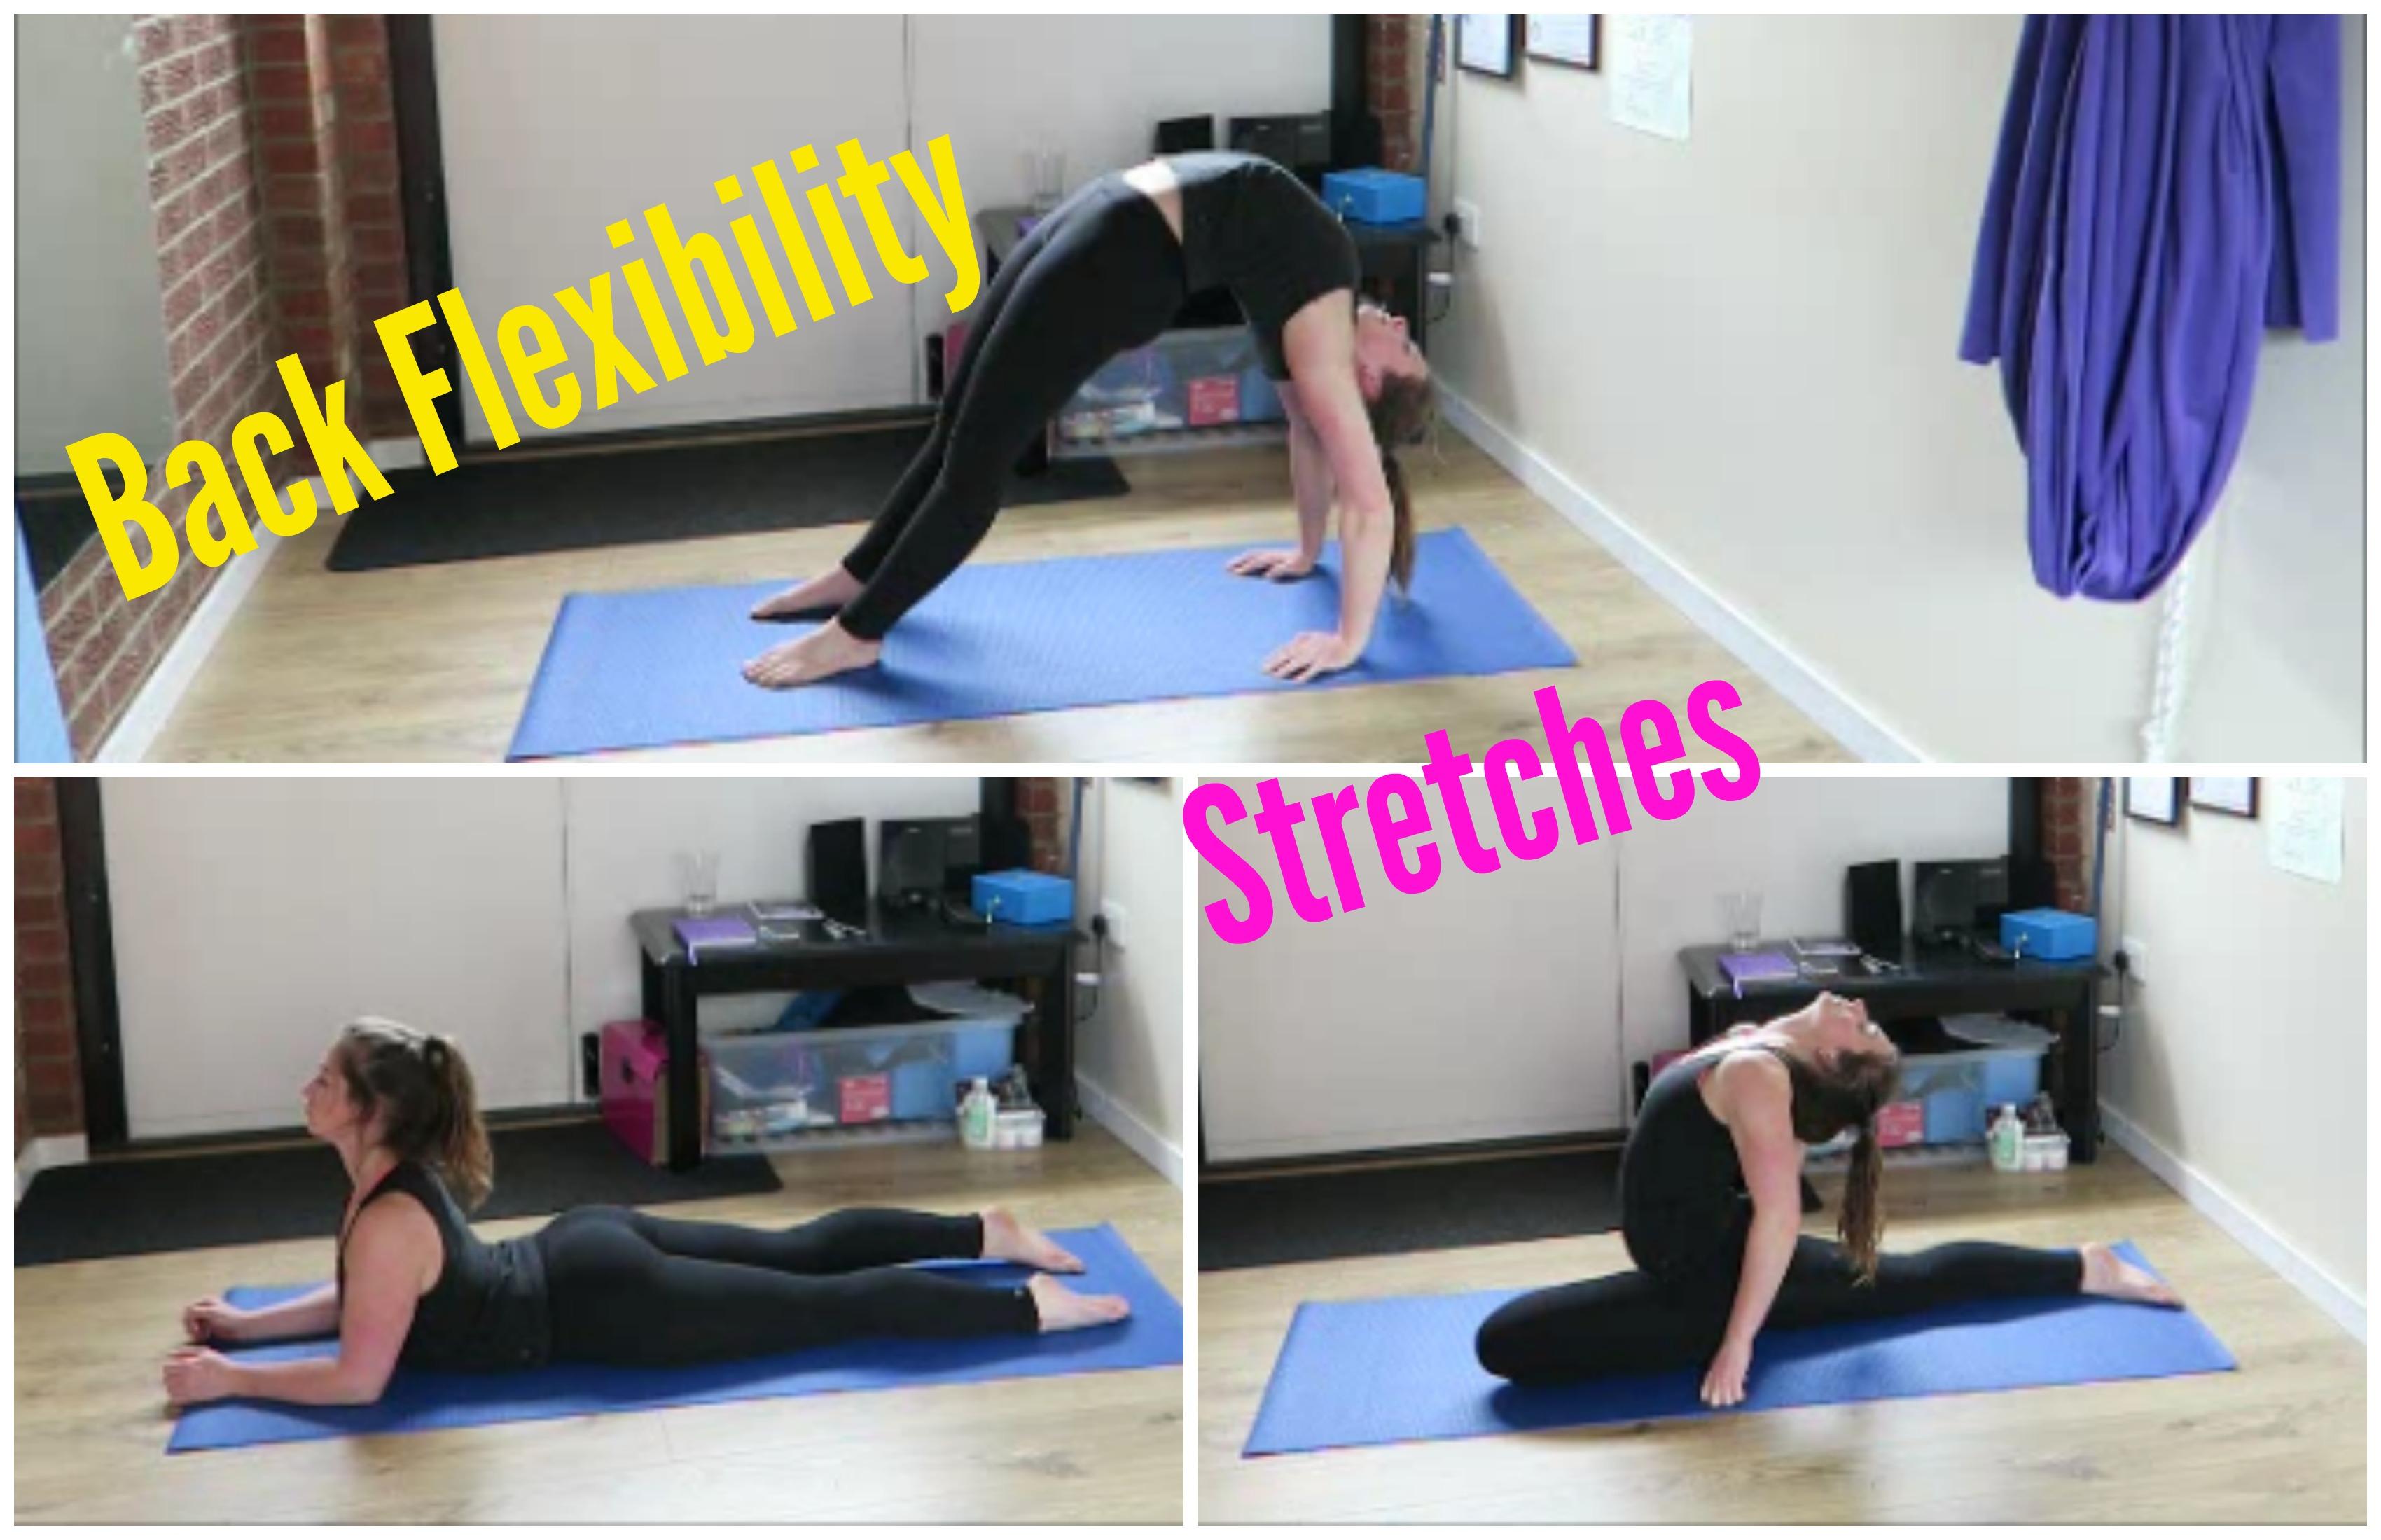 Back Flexibility Stretches